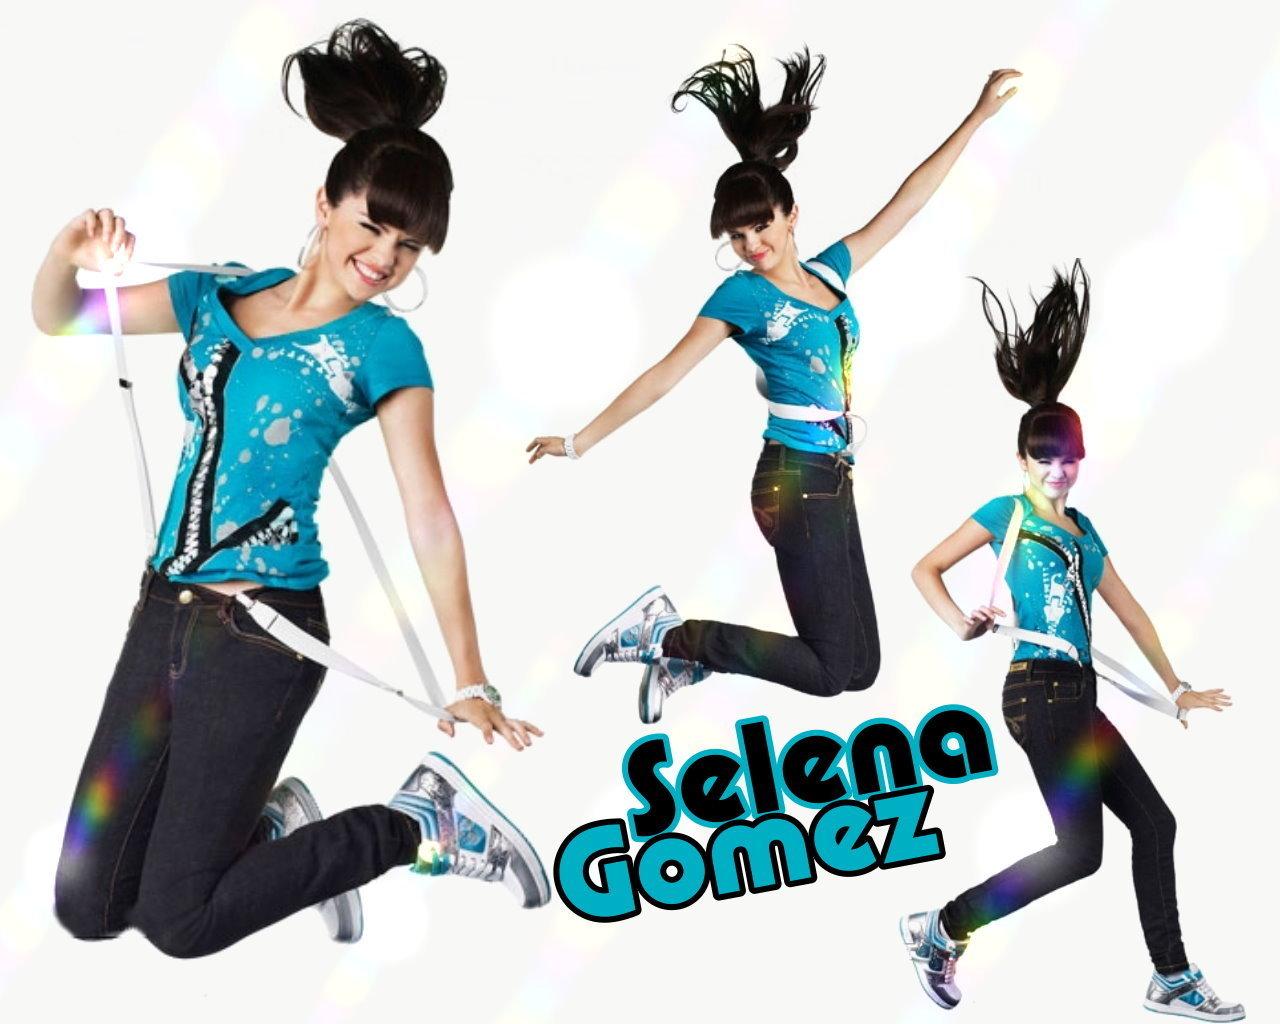 http://4.bp.blogspot.com/-t0PRDTzBVE4/T0cB-pdRyUI/AAAAAAAAABU/irIYou2bAvA/s1600/Selena-Gomez-Wallpaper-selena-gomez-Selena+Gomaz+Hd+Wallpapers+Beautiful+photosselena_gomez+1280-1024.jpg